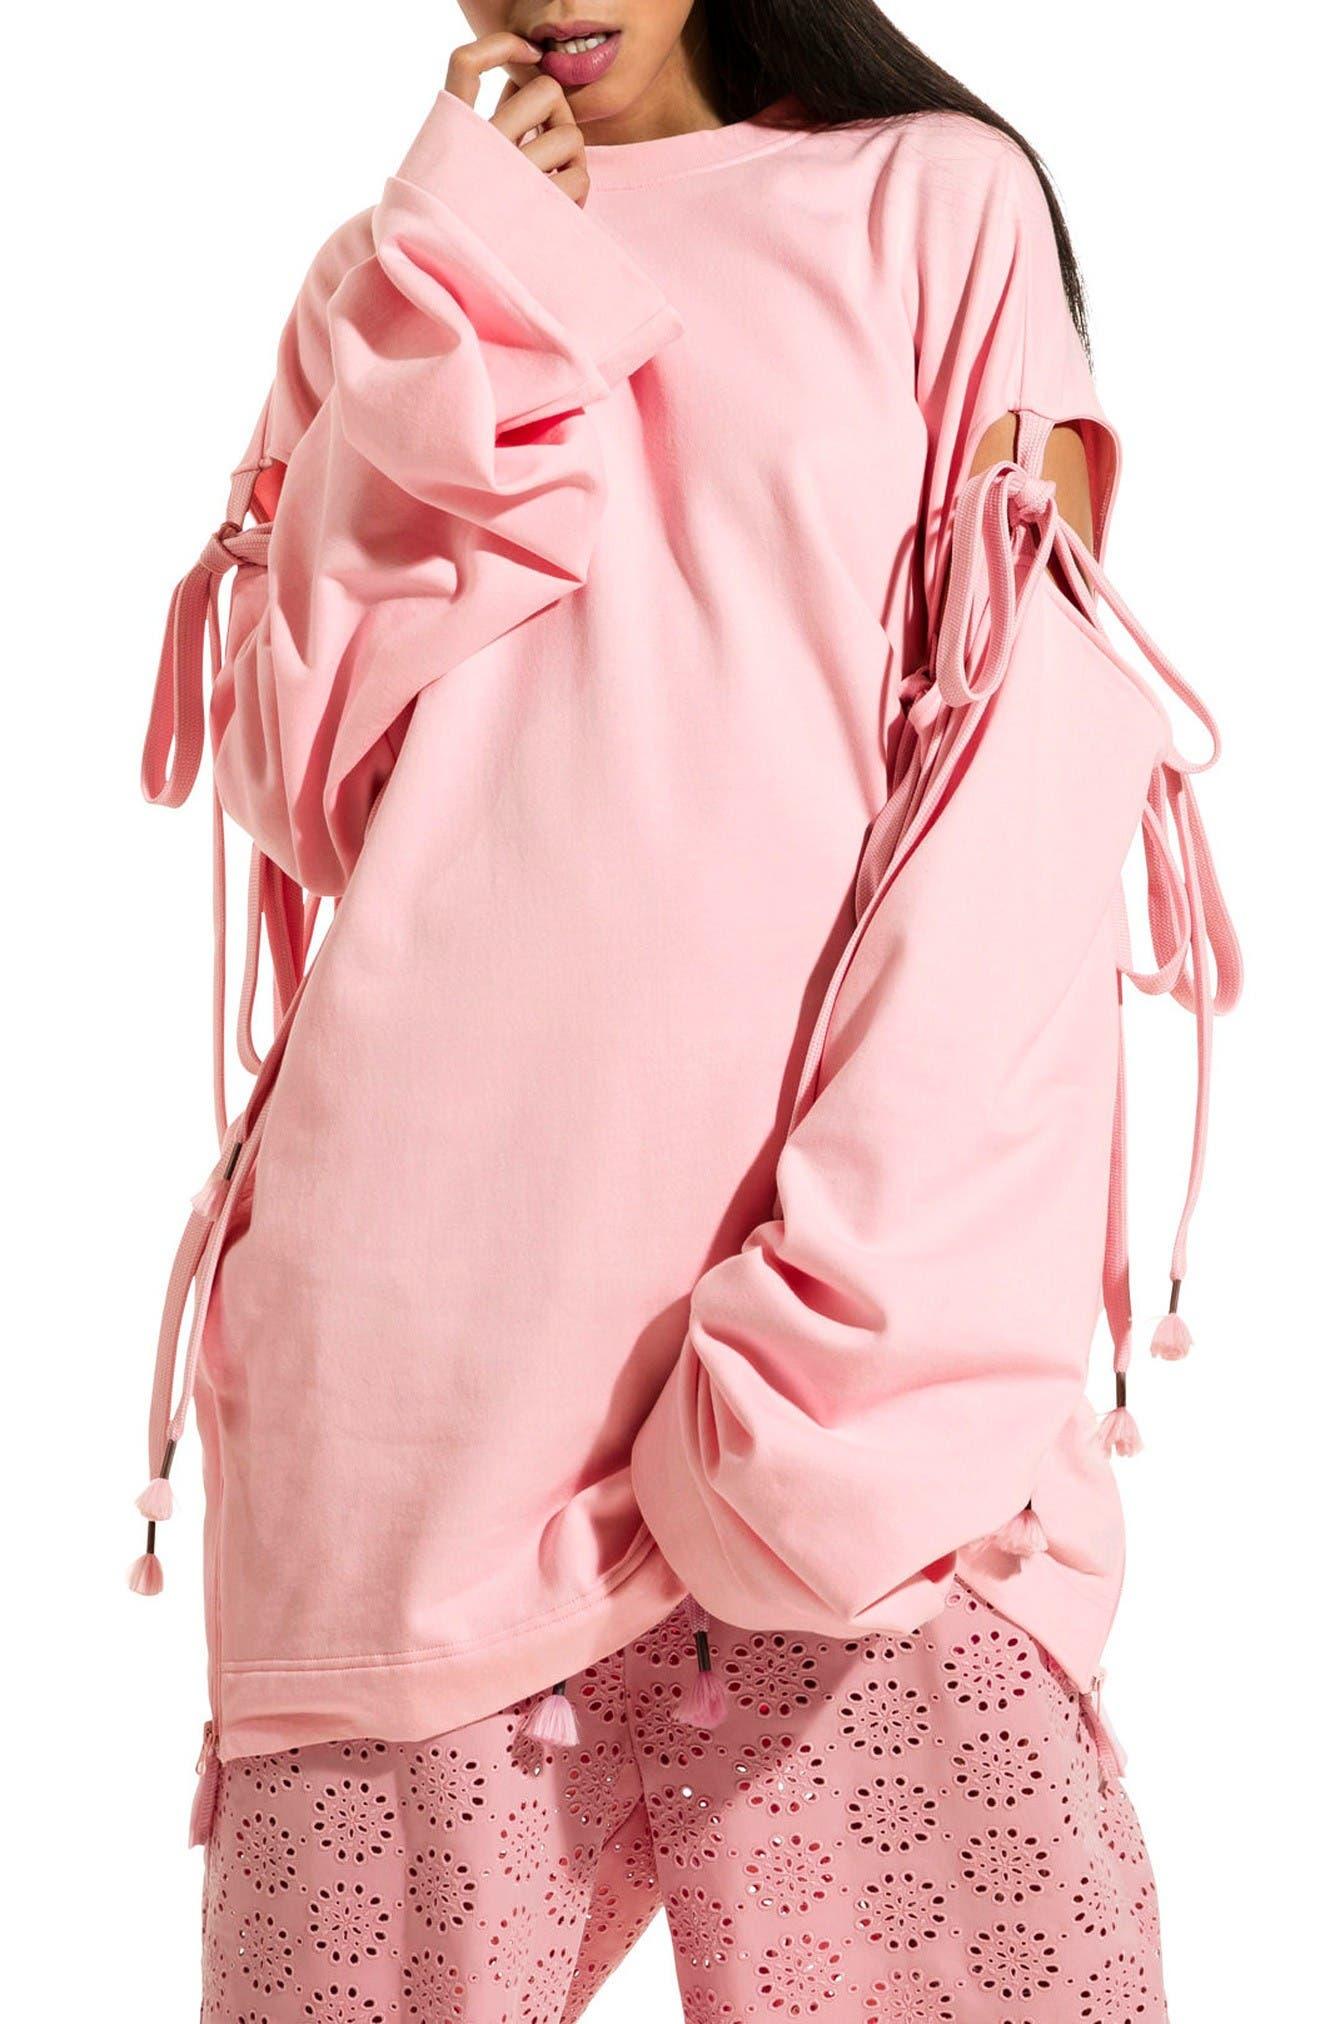 Main Image - FENTY PUMA by Rihanna Oversize Convertible Sleeve Sweatshirt